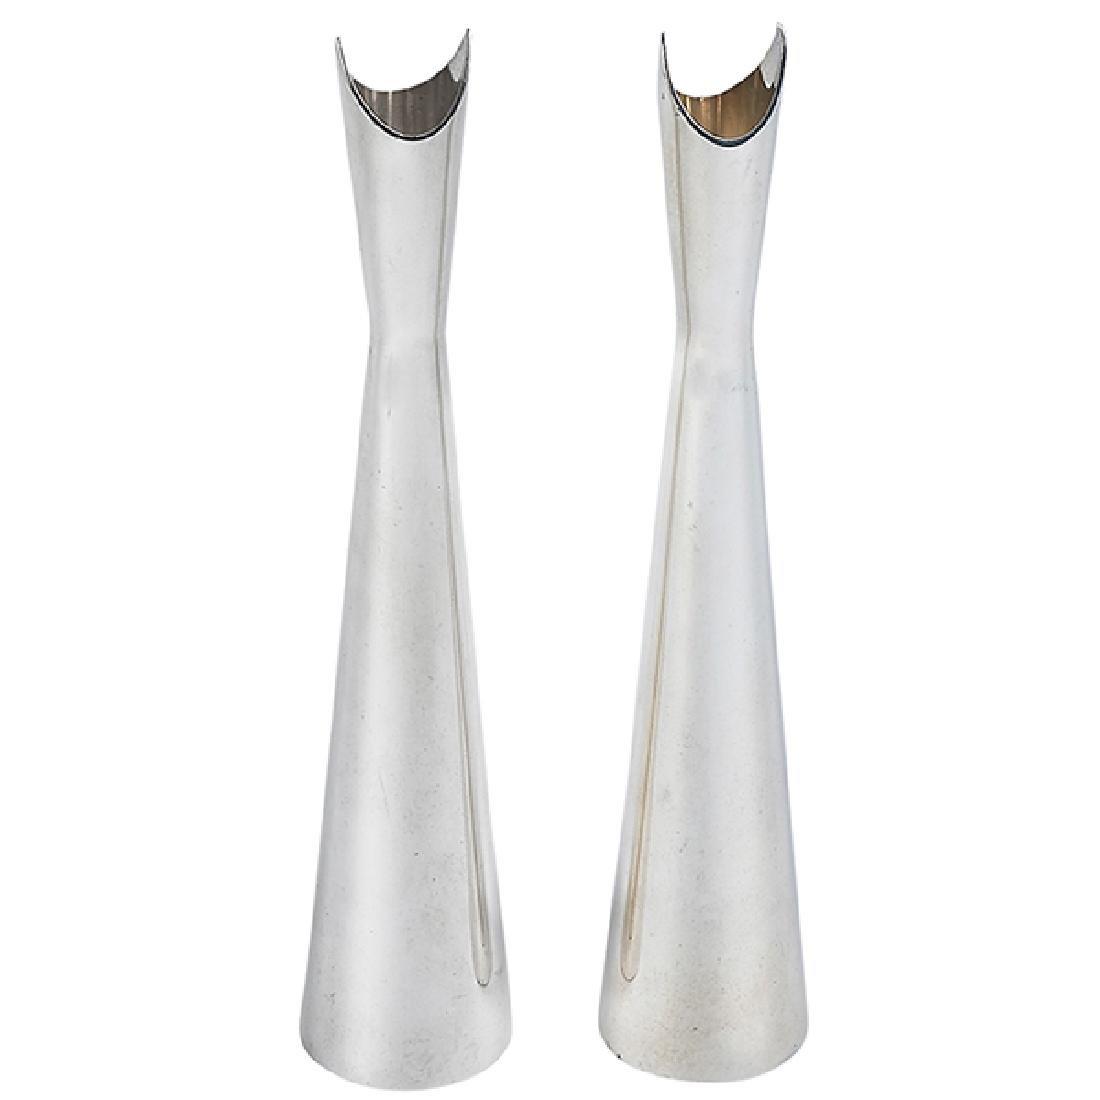 "Lino Sabattini (b. 1925) Cardinale vases, two 1.5""dia x"